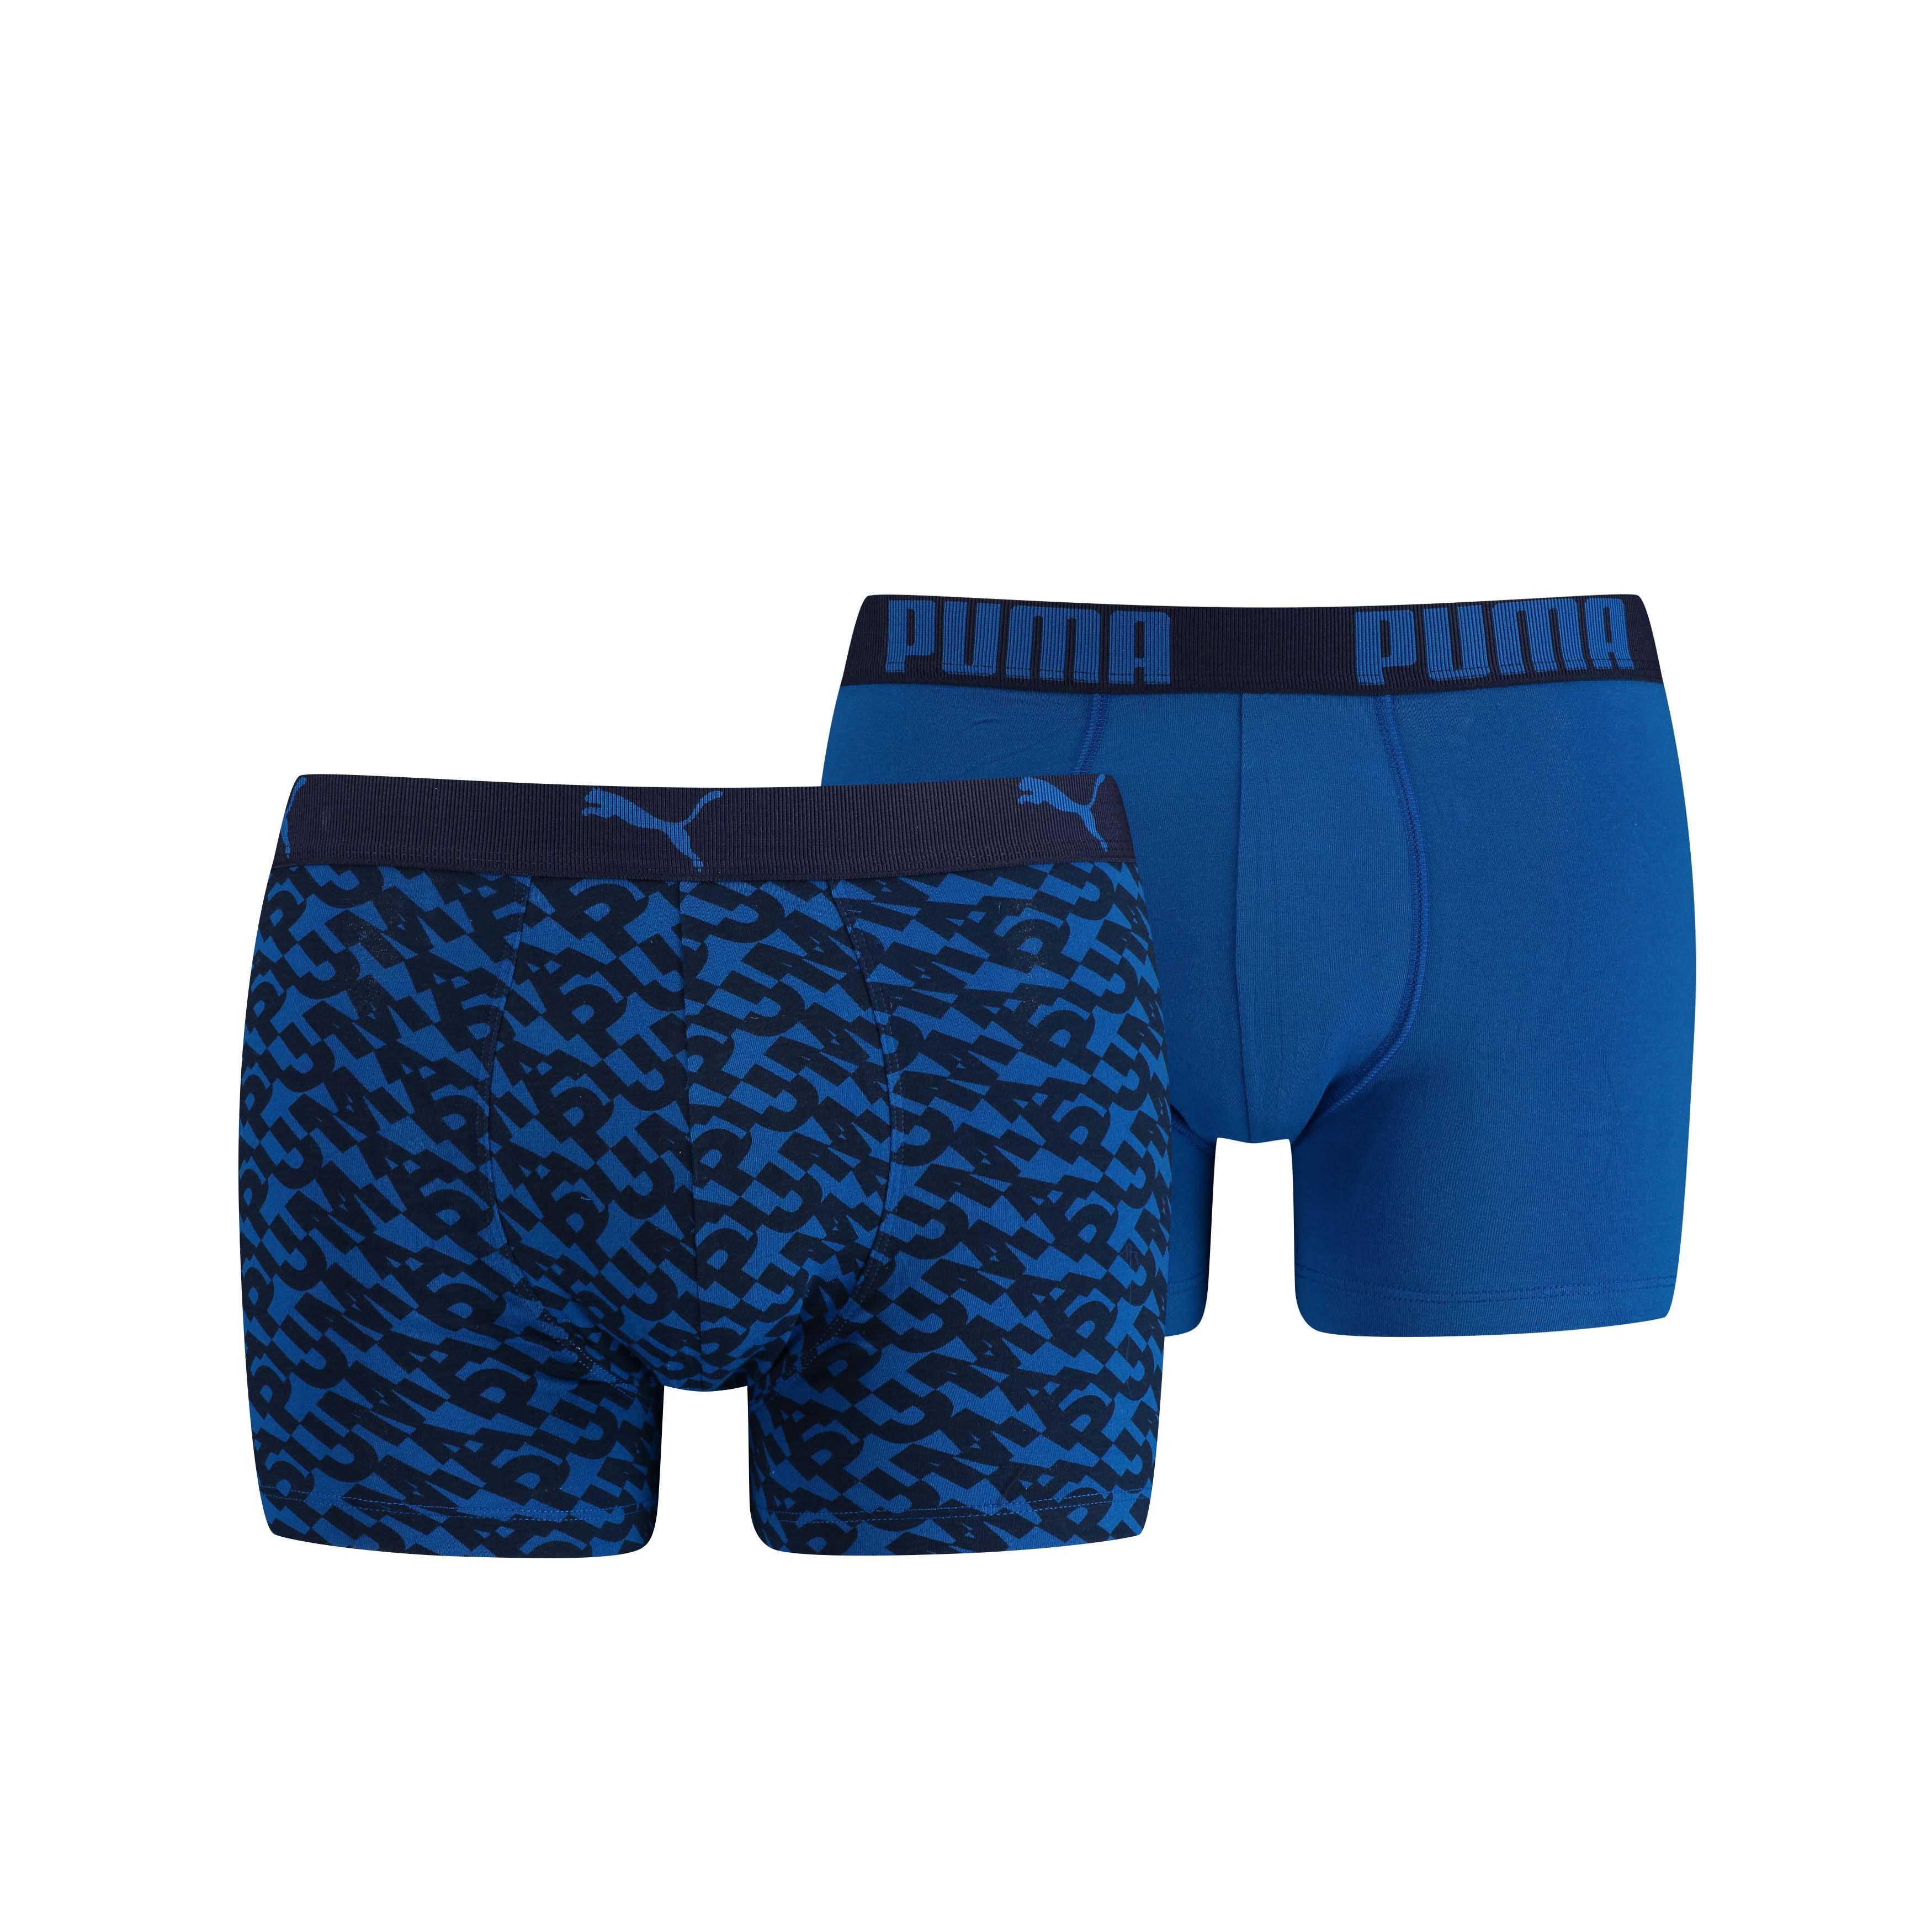 Puma Boxershorts Logo AOP Blue 2-Pack-S